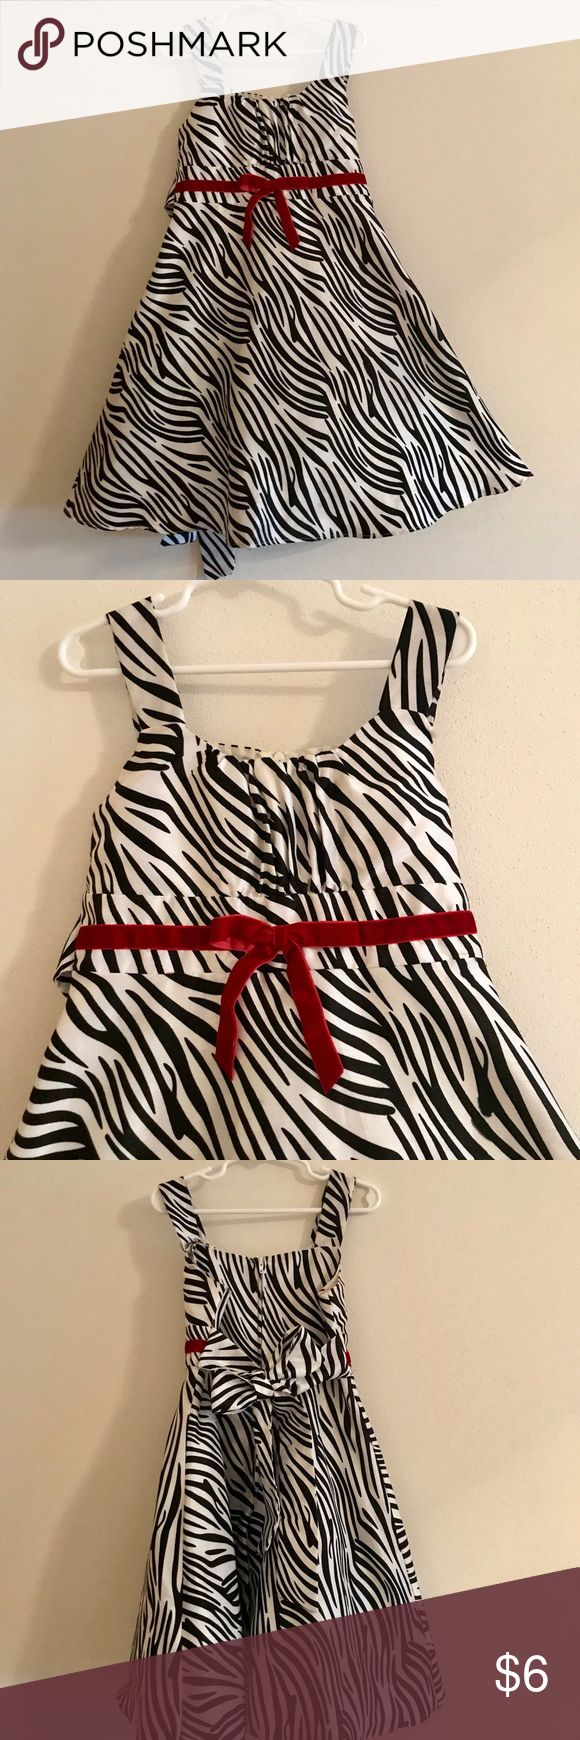 the 25 best zebra print dresses ideas on pinterest zebra print